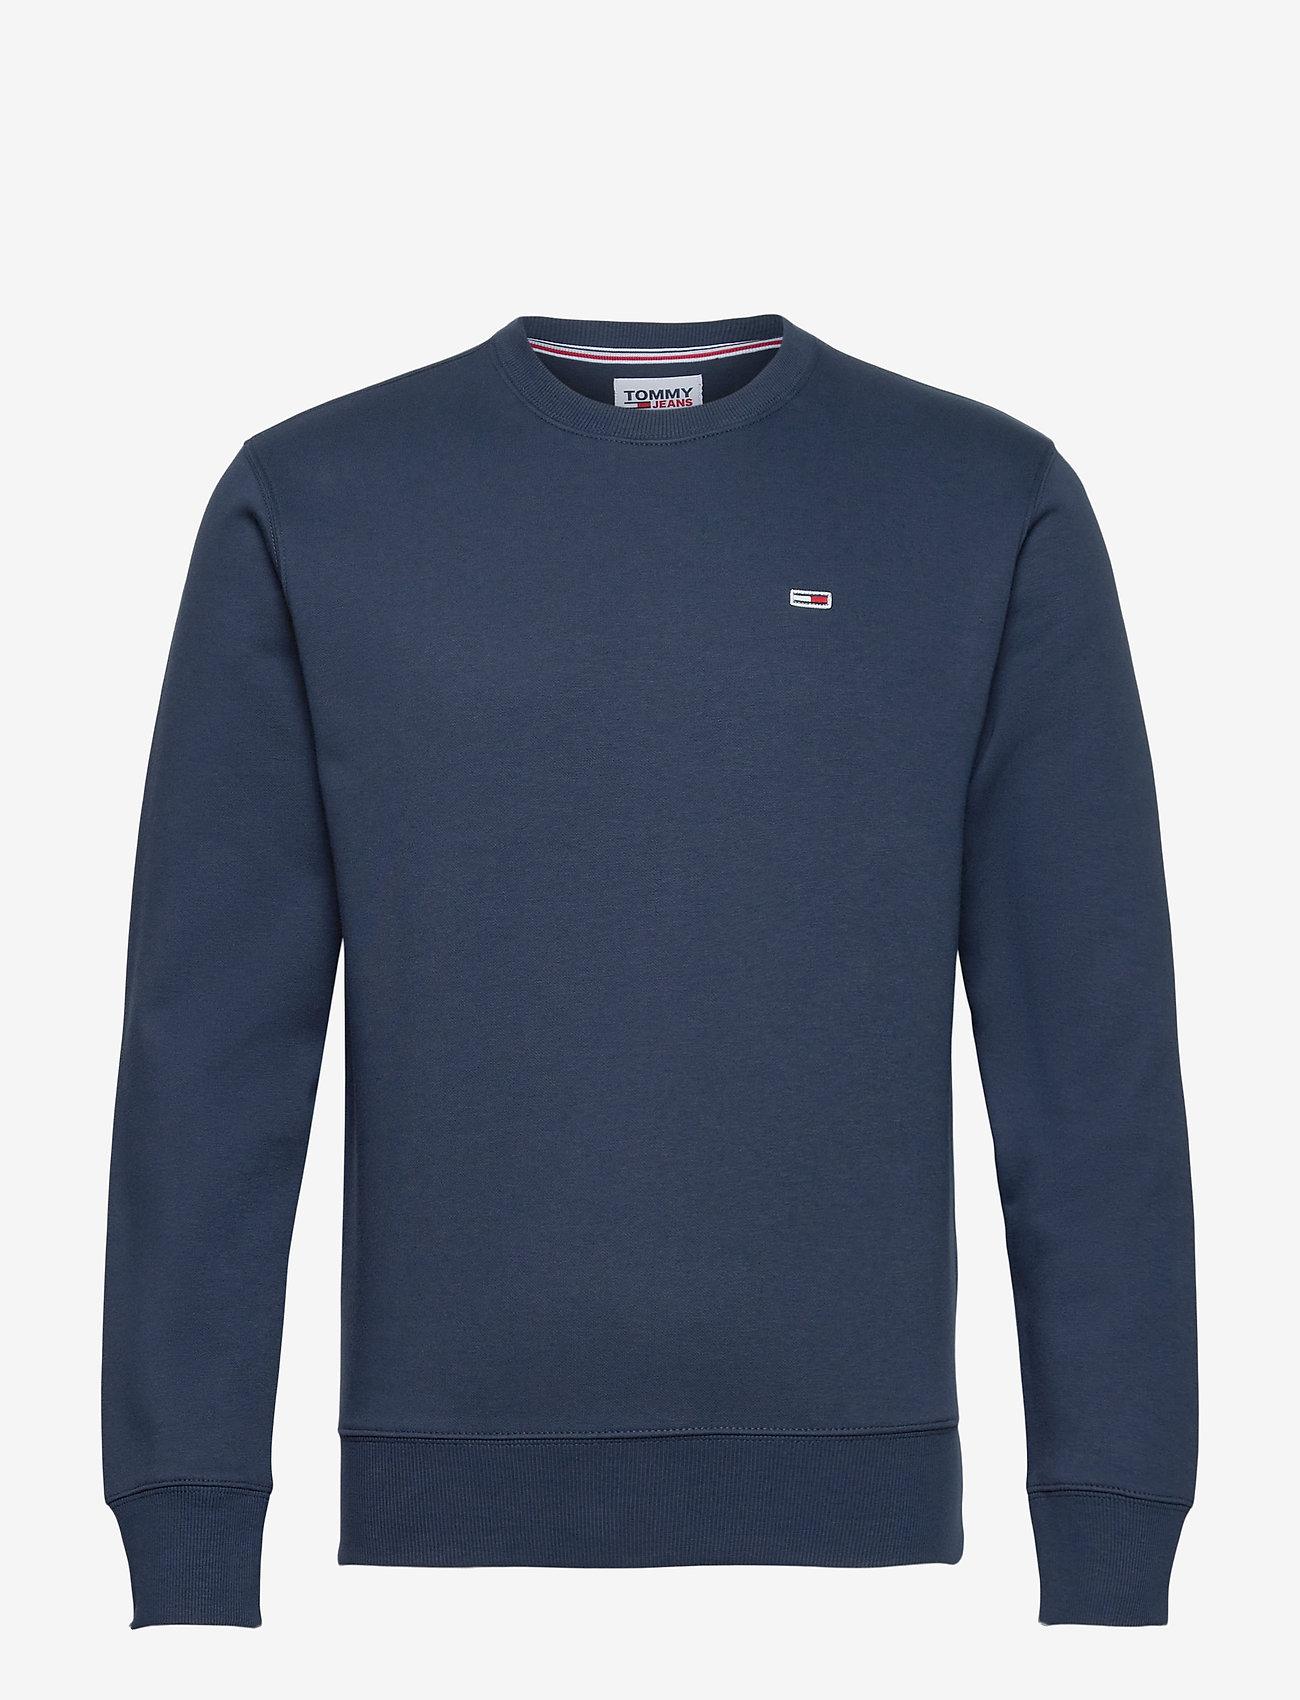 Tommy Jeans - TJM REGULAR FLEECE C NECK - kläder - twilight navy - 0